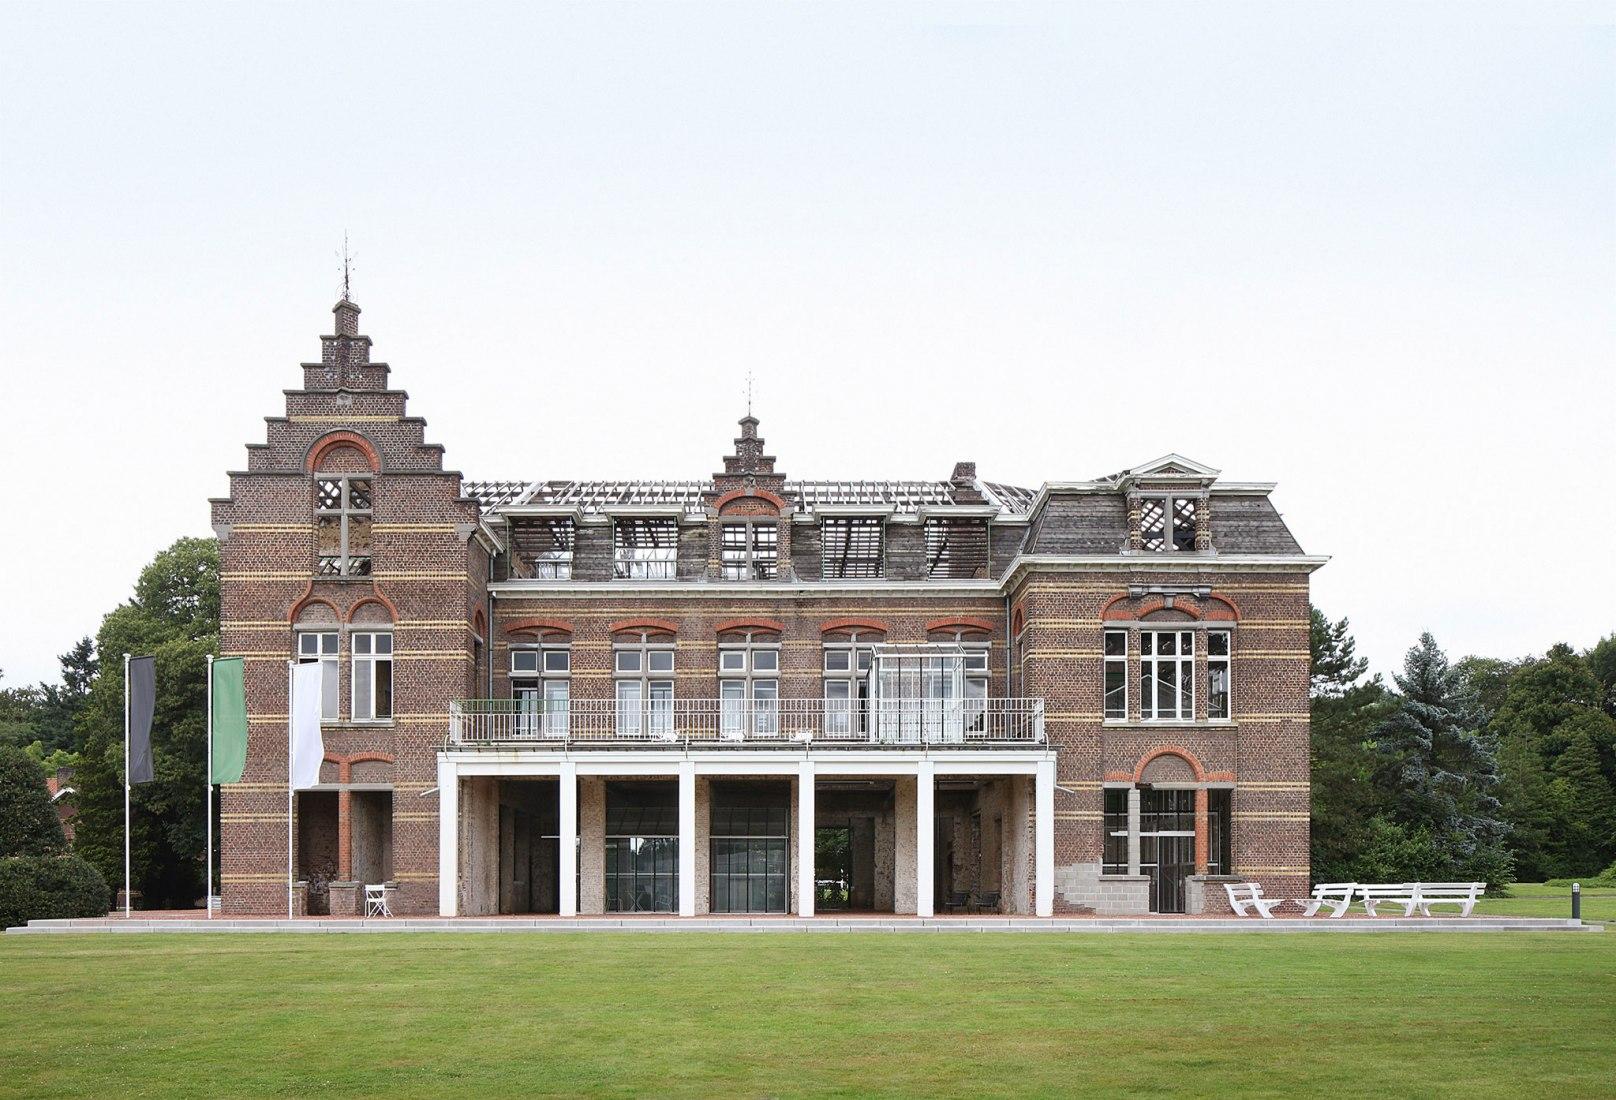 PC Caritas by architecten de Vylder Vinck Taillieu. Photograph by Filip Dujardin.